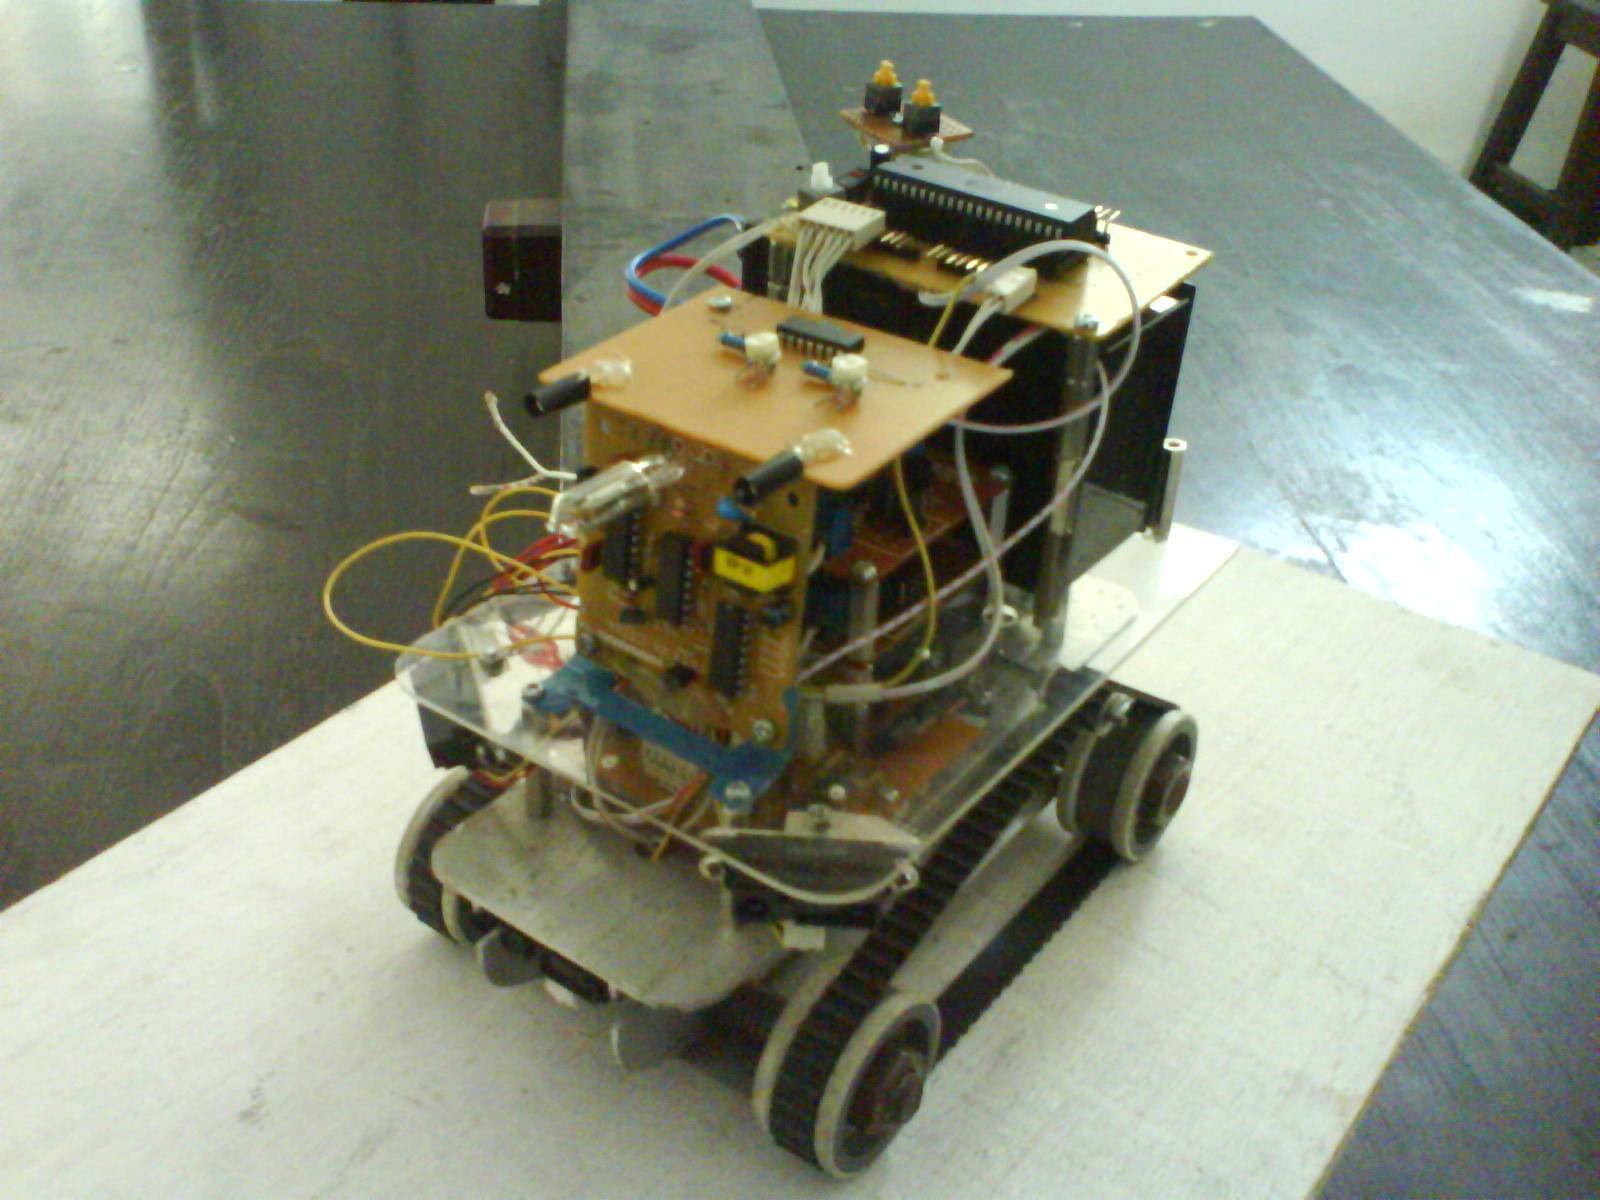 Autonomous robot mobil pemadam api menggunakan sensor